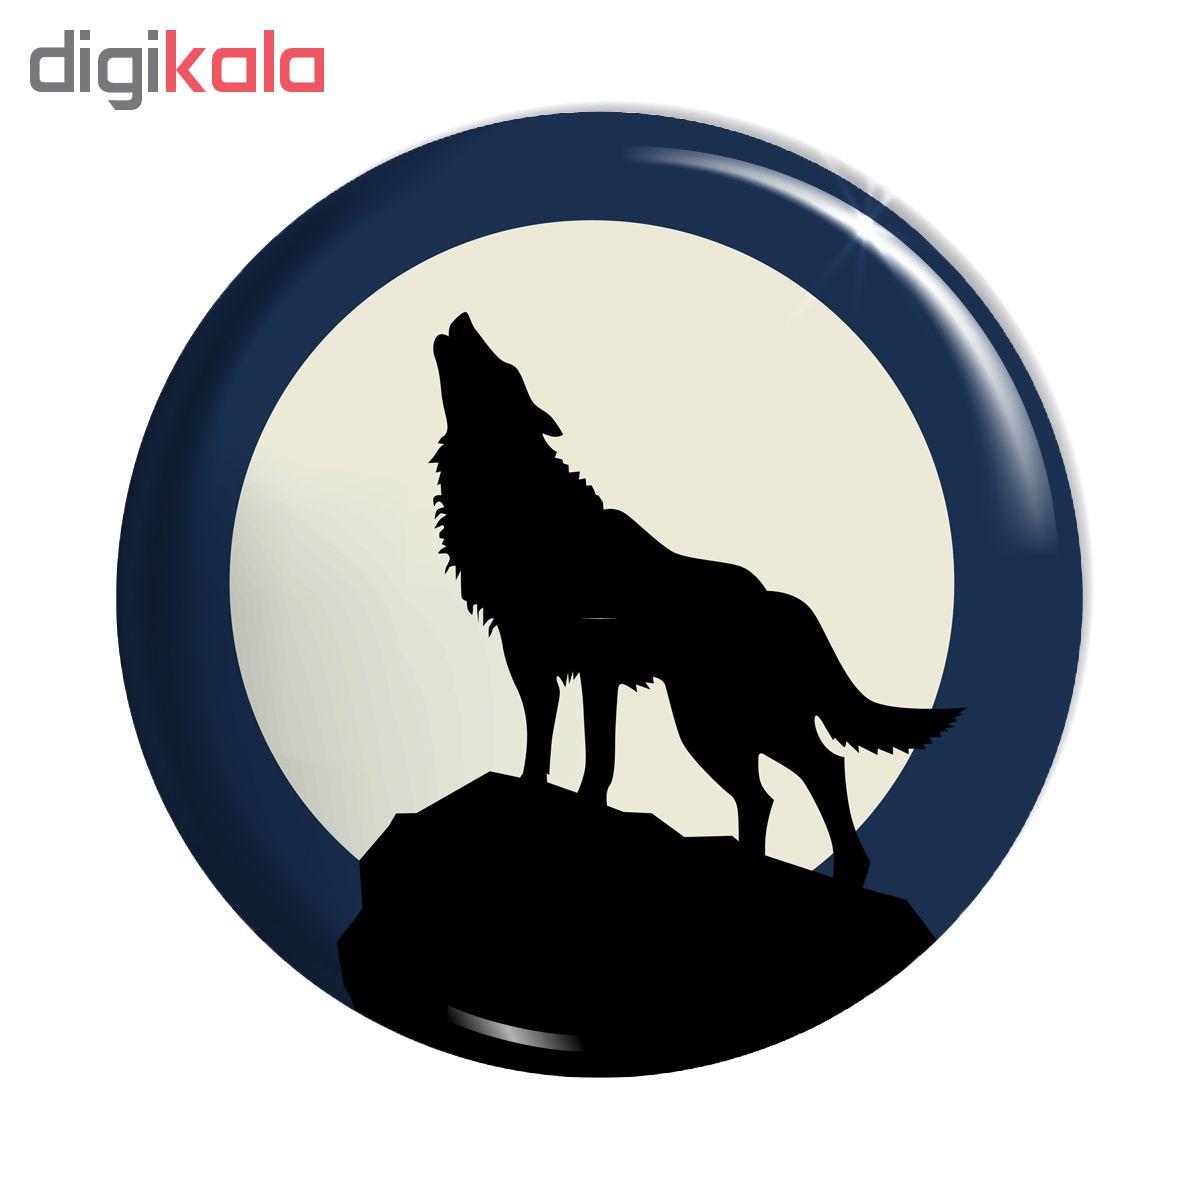 پیکسل اسانا طرح گرگ روباه حیوانات کد ASA010